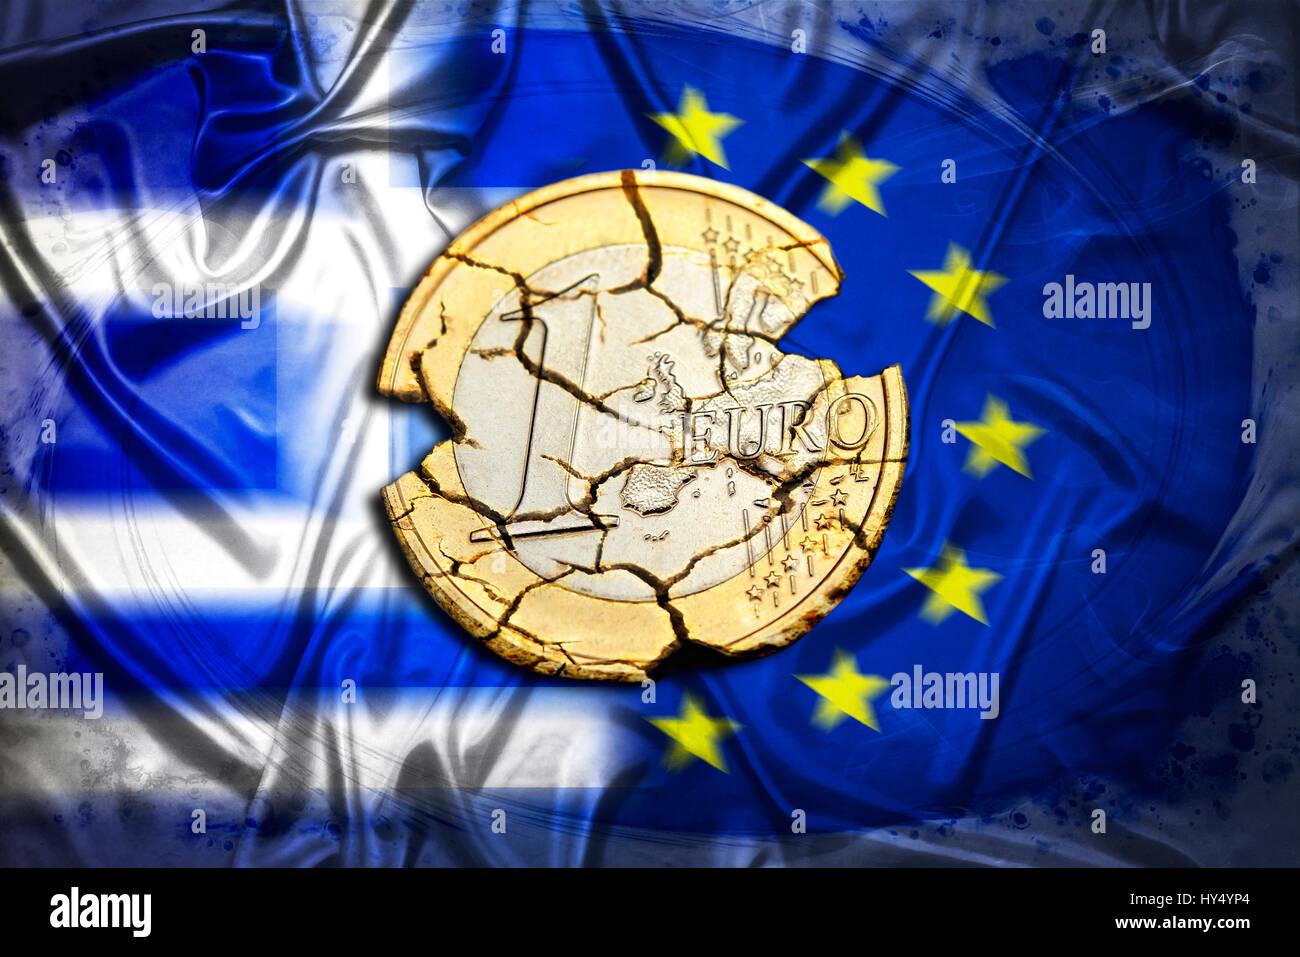 Ruined eurocoin before Greece and EU flag, symbolic photo Grexit, Zerfallene Euromuenze vor Griechenland- und EU-Fahne, Symbolfoto Grexit Stock Photo